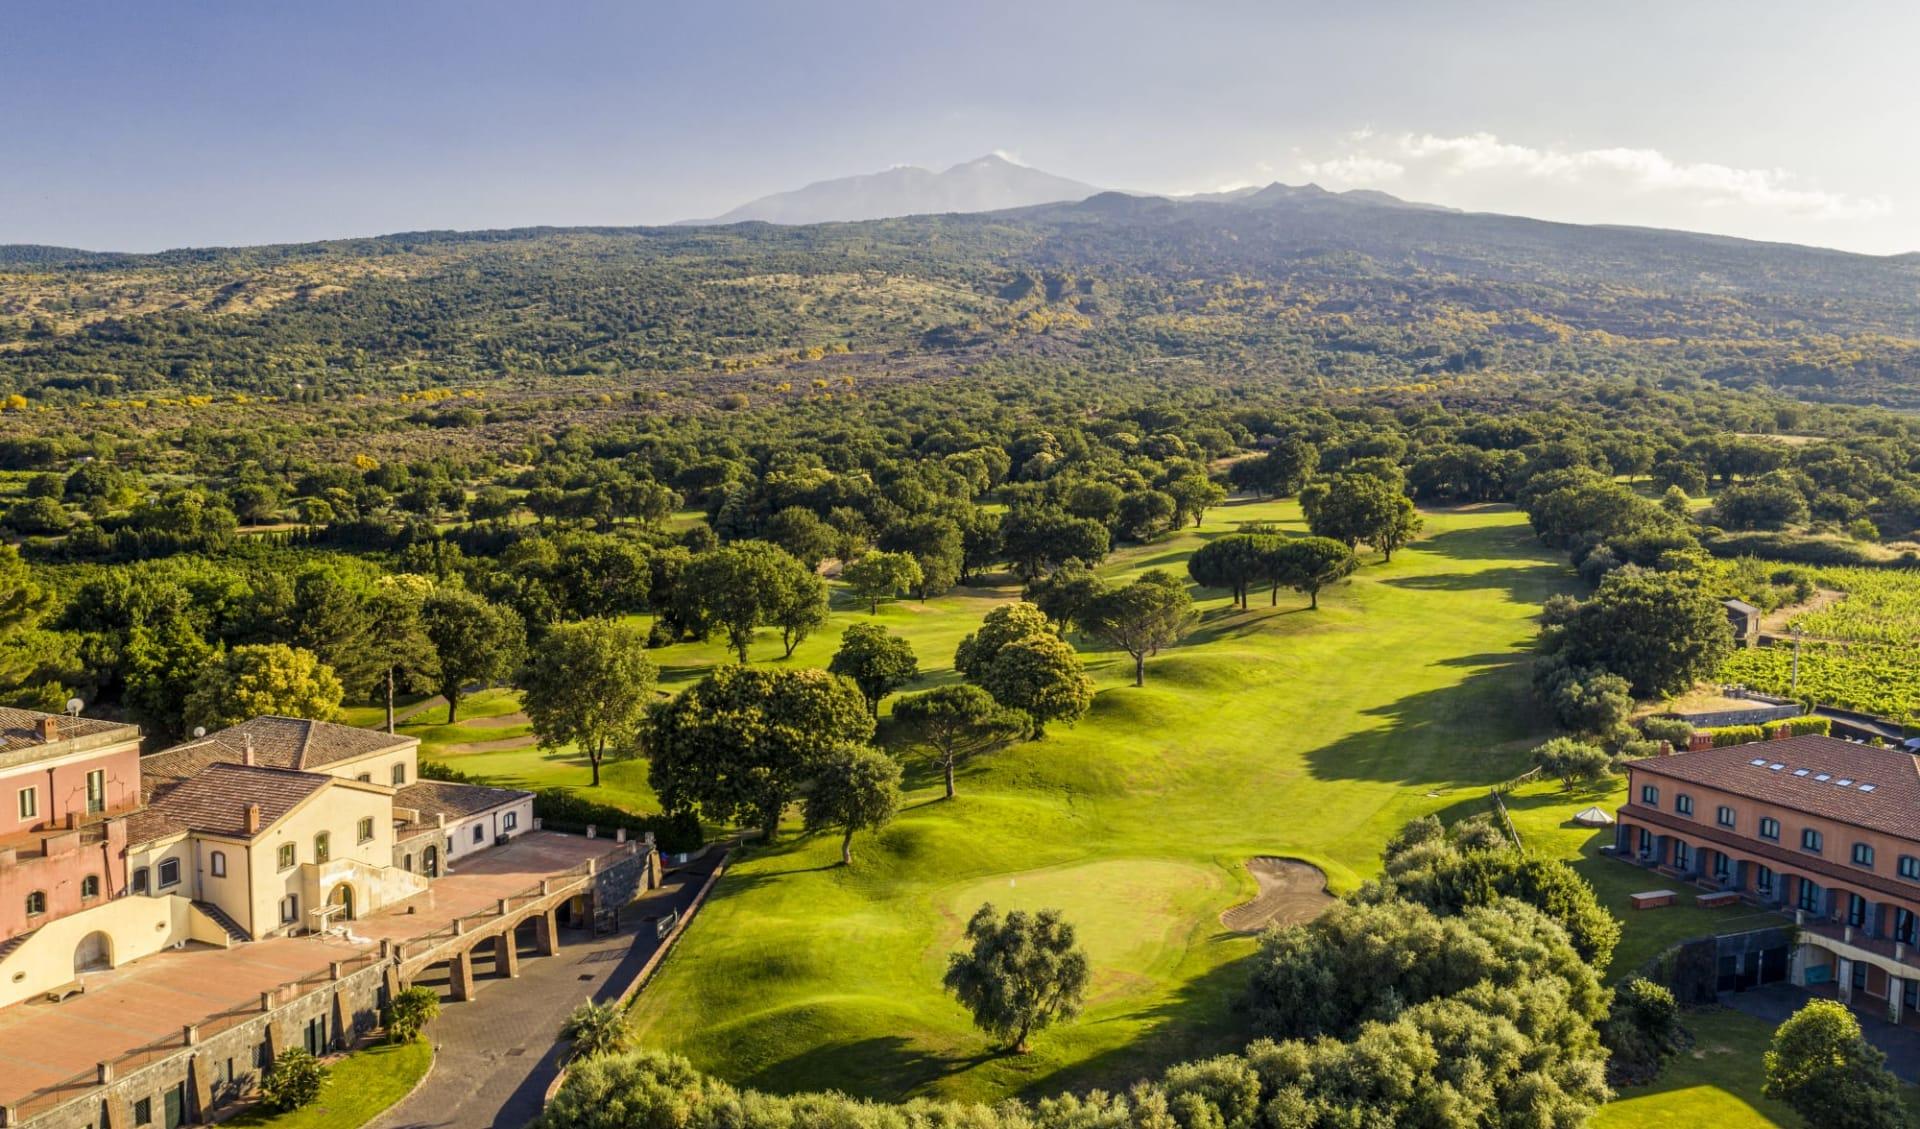 15.10. - 22.10.2021 Golf & Kultur auf Sizilien ab Catania: 1il-picciolo-etna-golf-club_25_49049950047_o